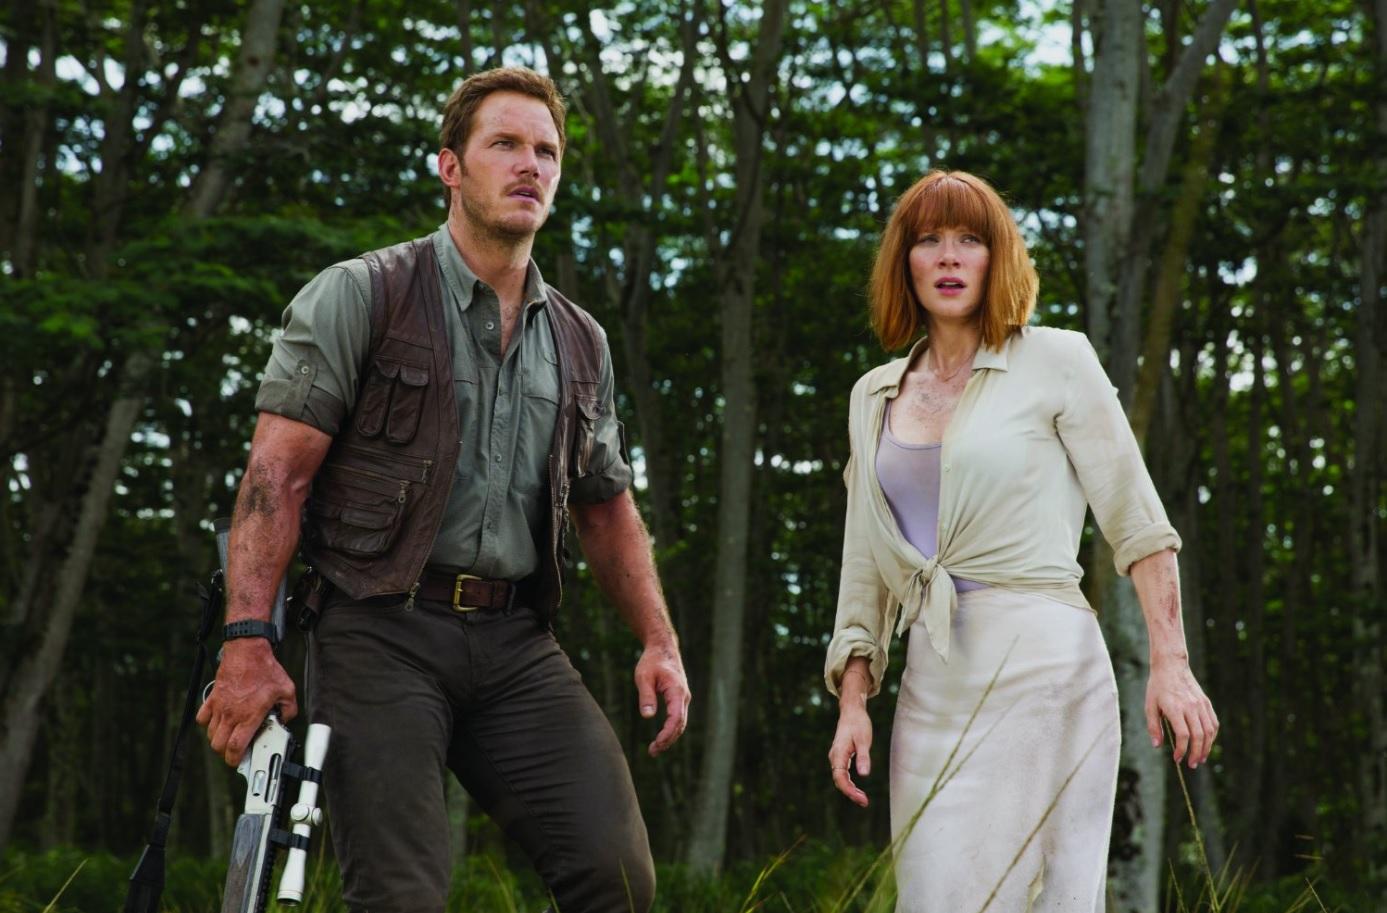 Director Insists 'Darker, Scarier' Film Despite Comedic Chris Pratt